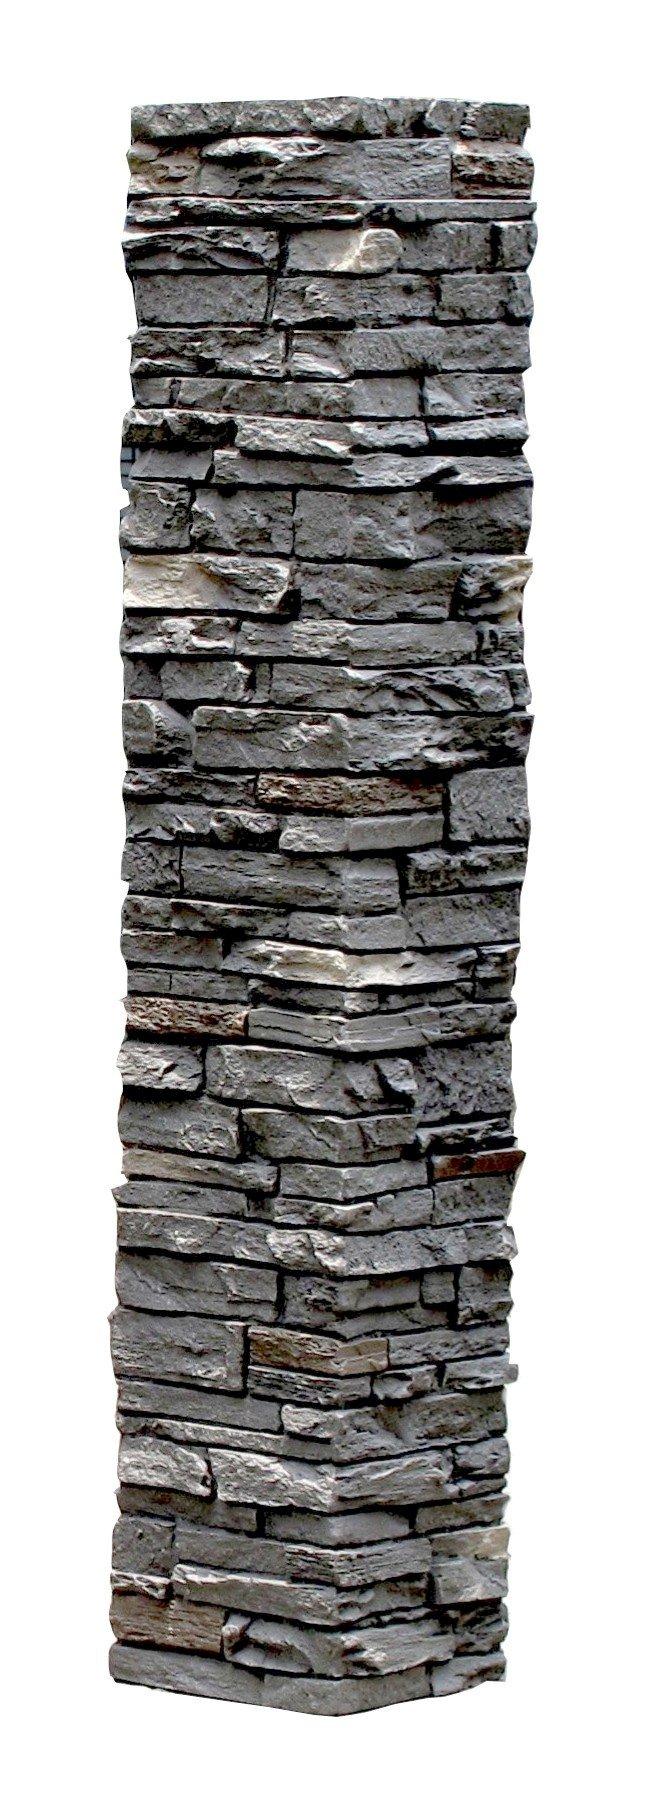 NextStone Slatestone 1pc 8'' x 8'' x 41'' Post Cover Rundle Ridge